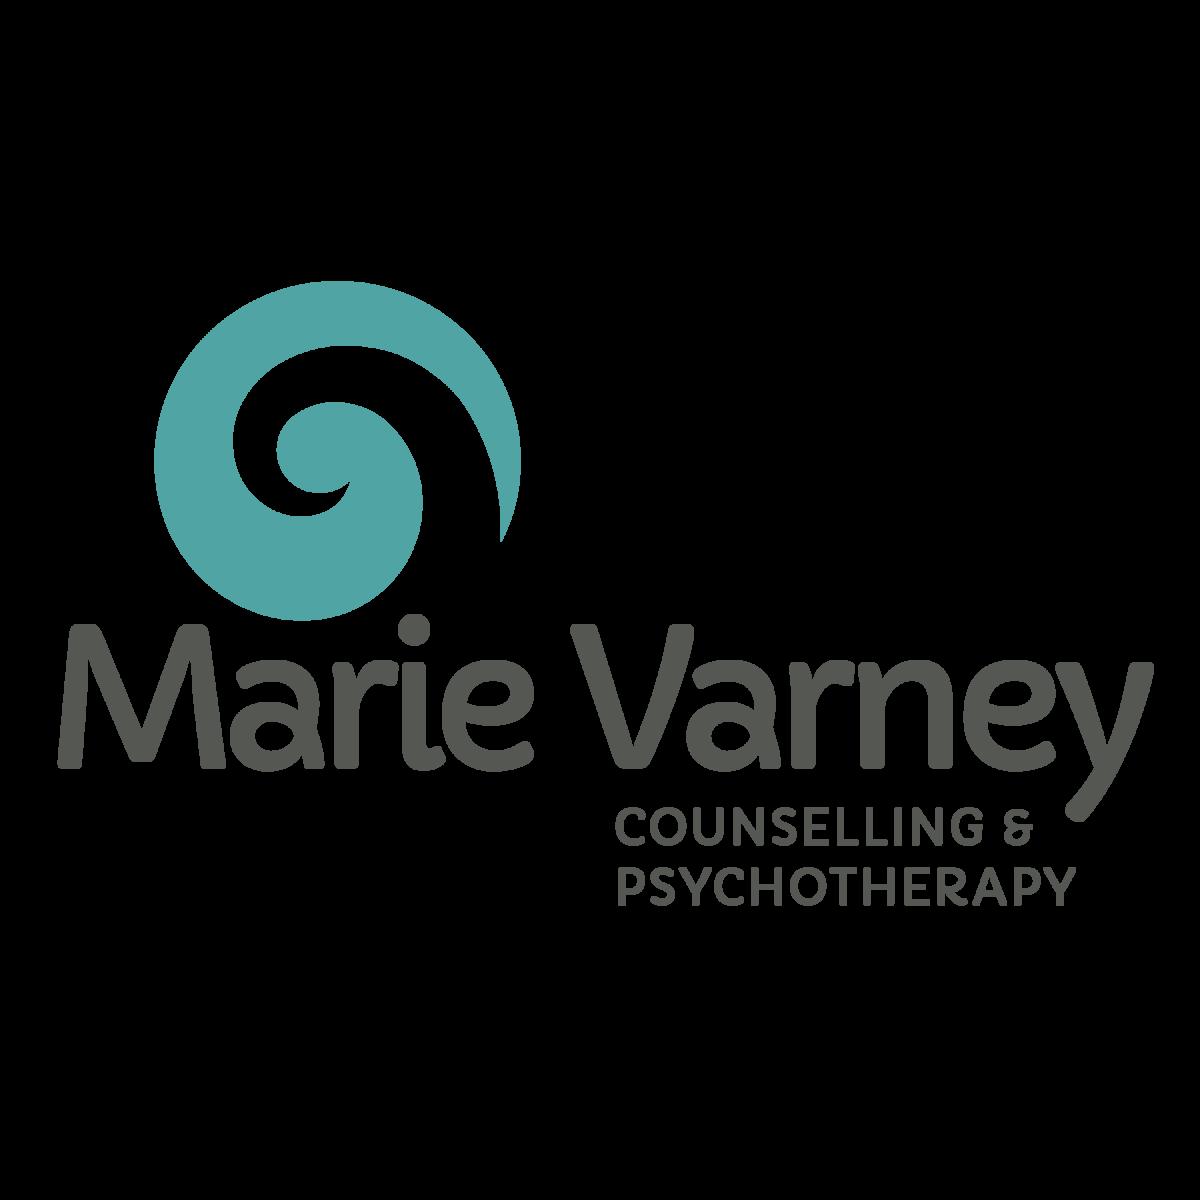 Marie Varney logo